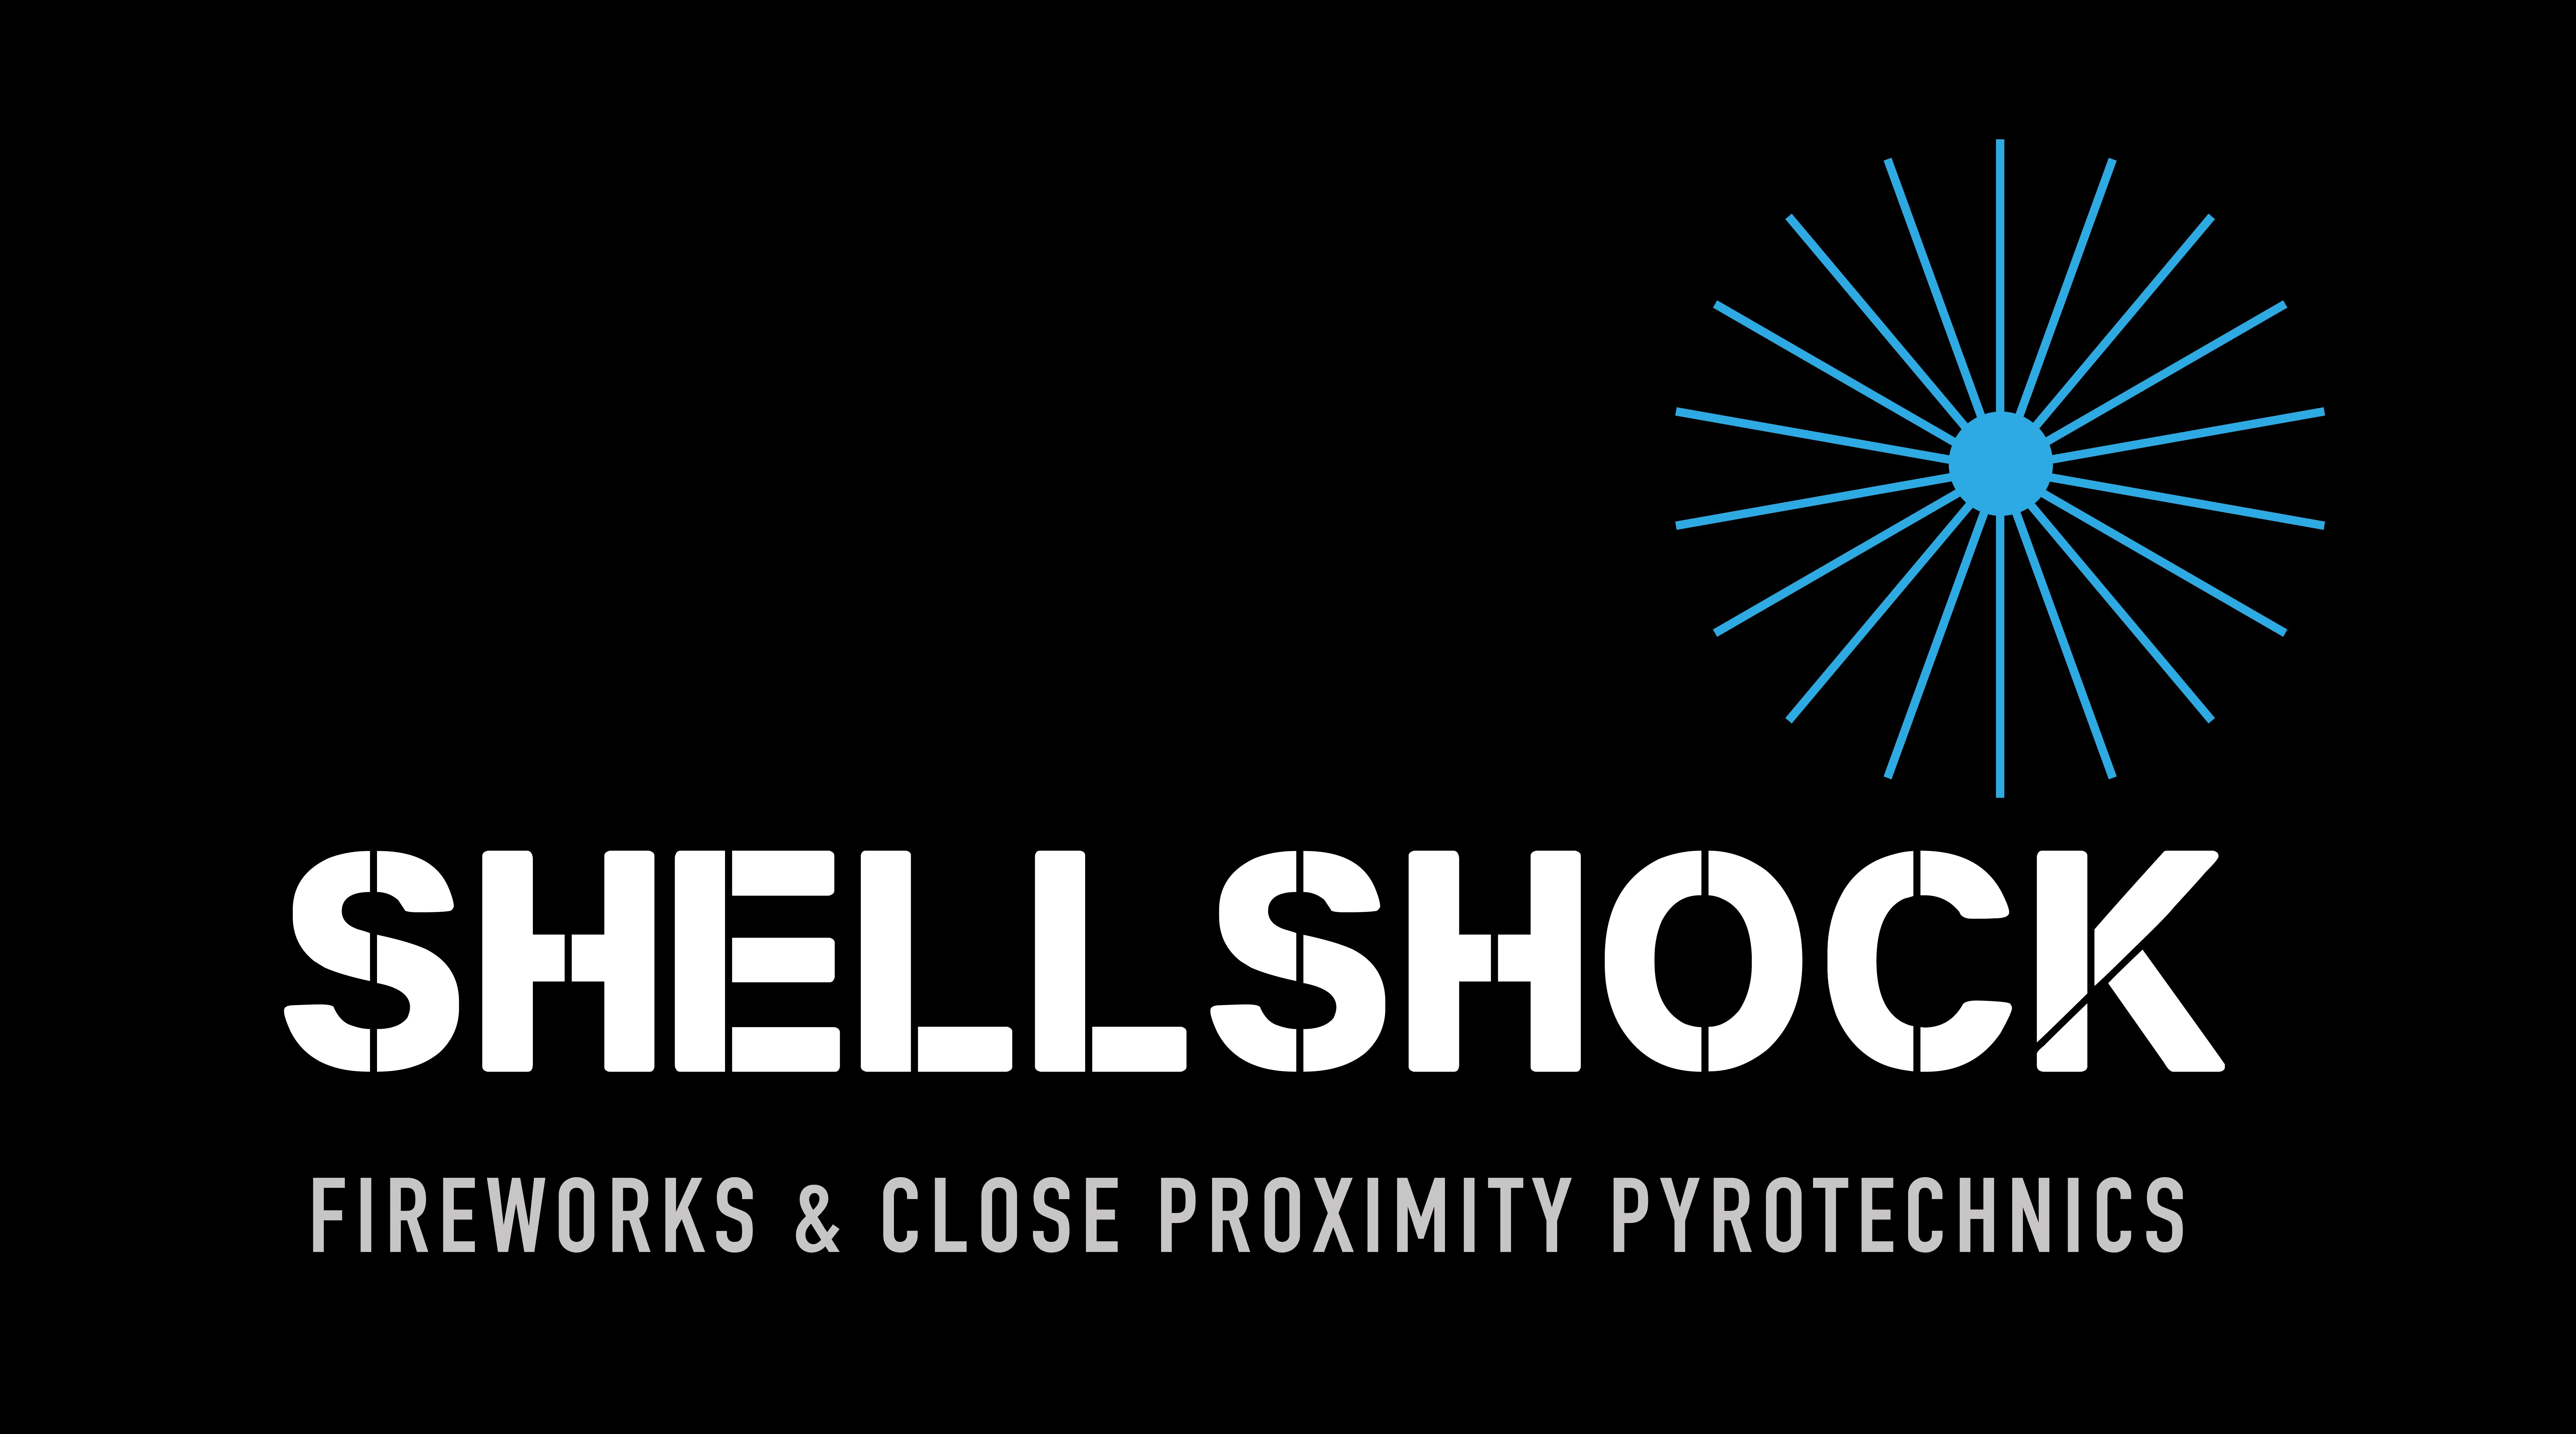 SHELLSHOCK_BLACK_MAIN_LOGO